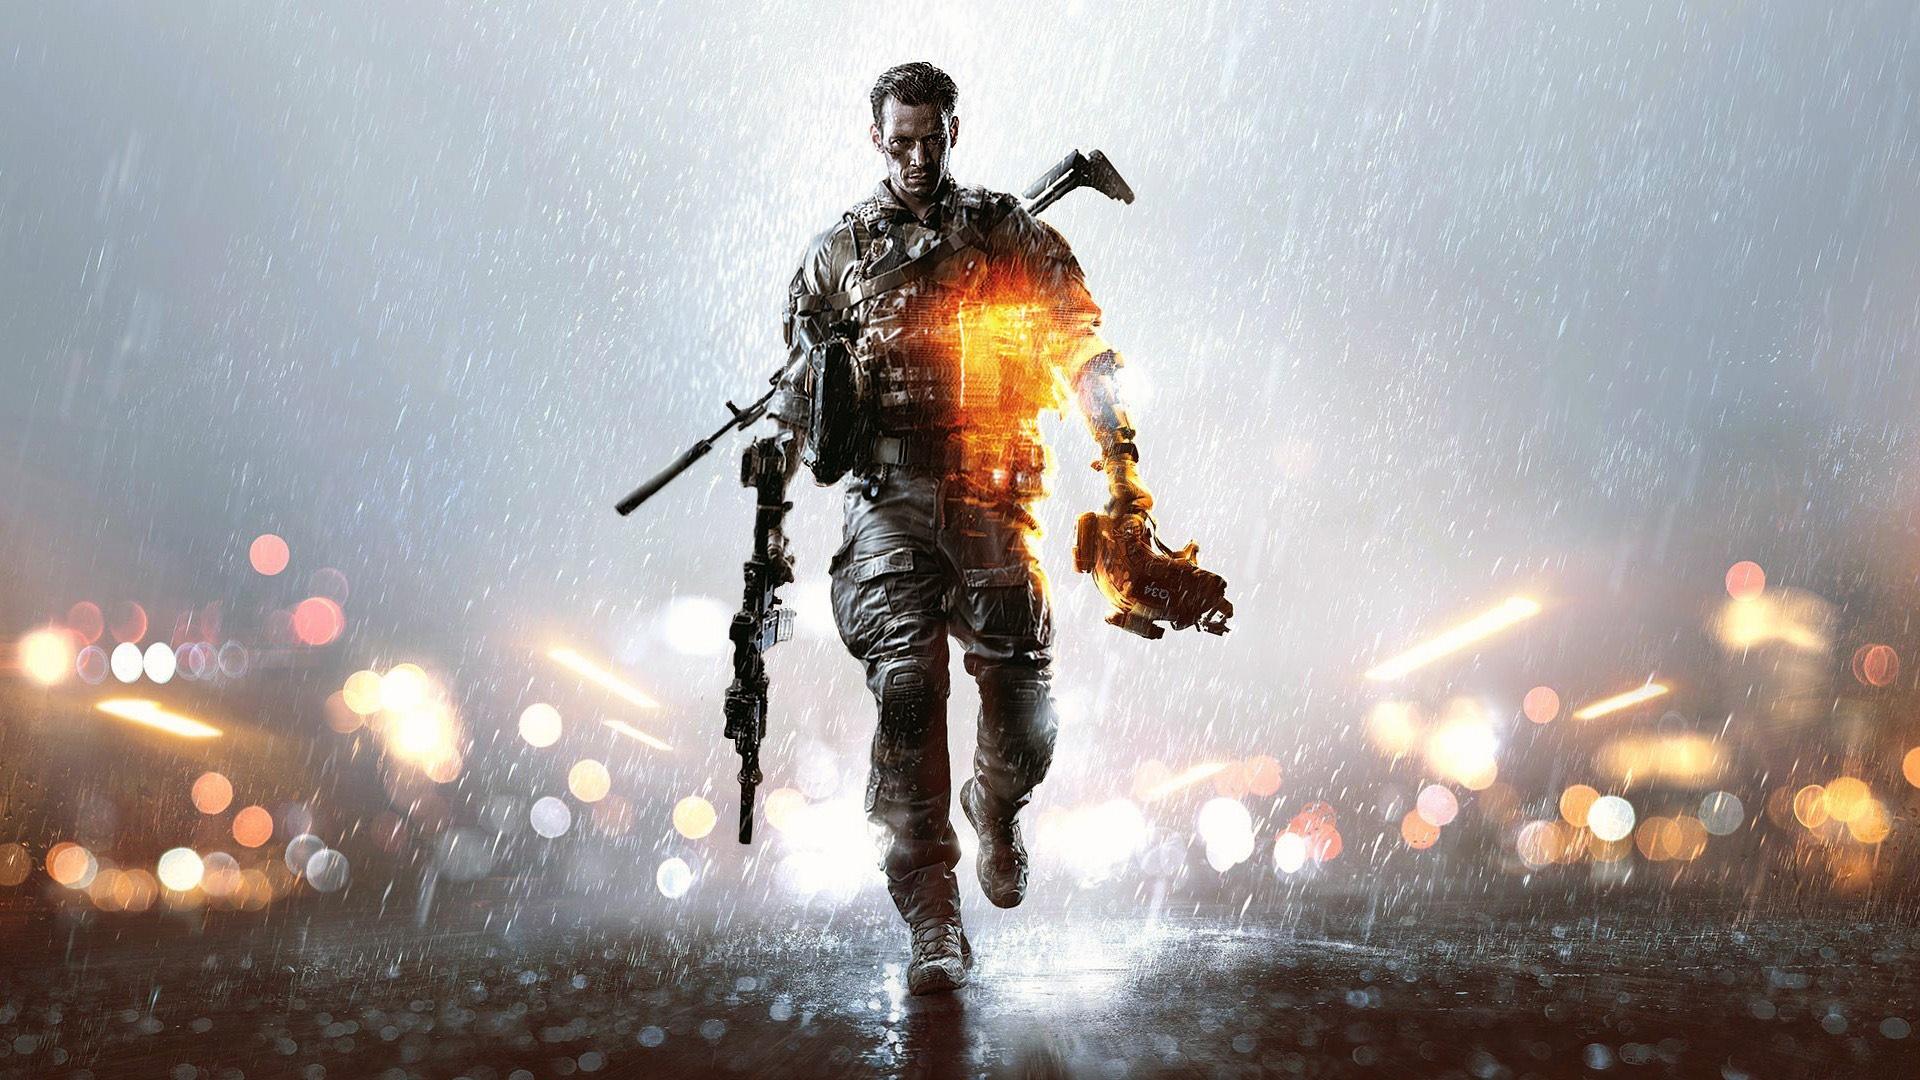 Battlefield 4 Game Poster